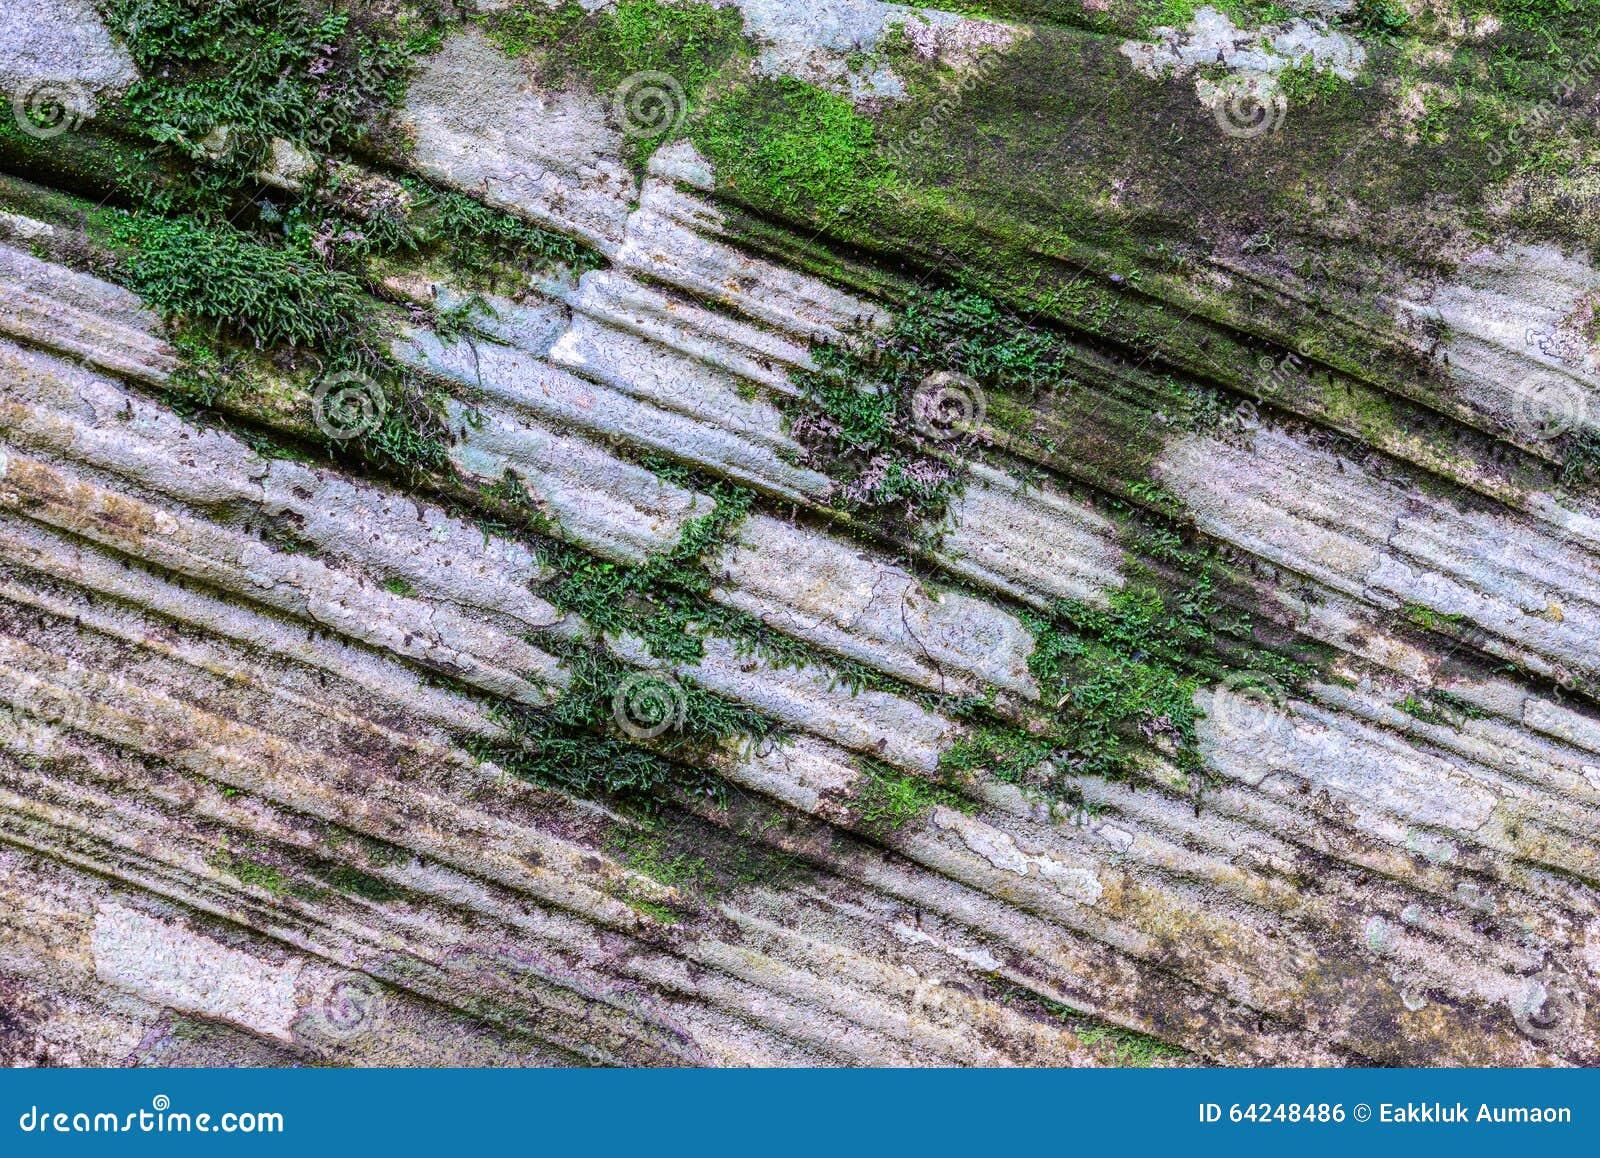 Coverd мха на каменной текстуре в лесе